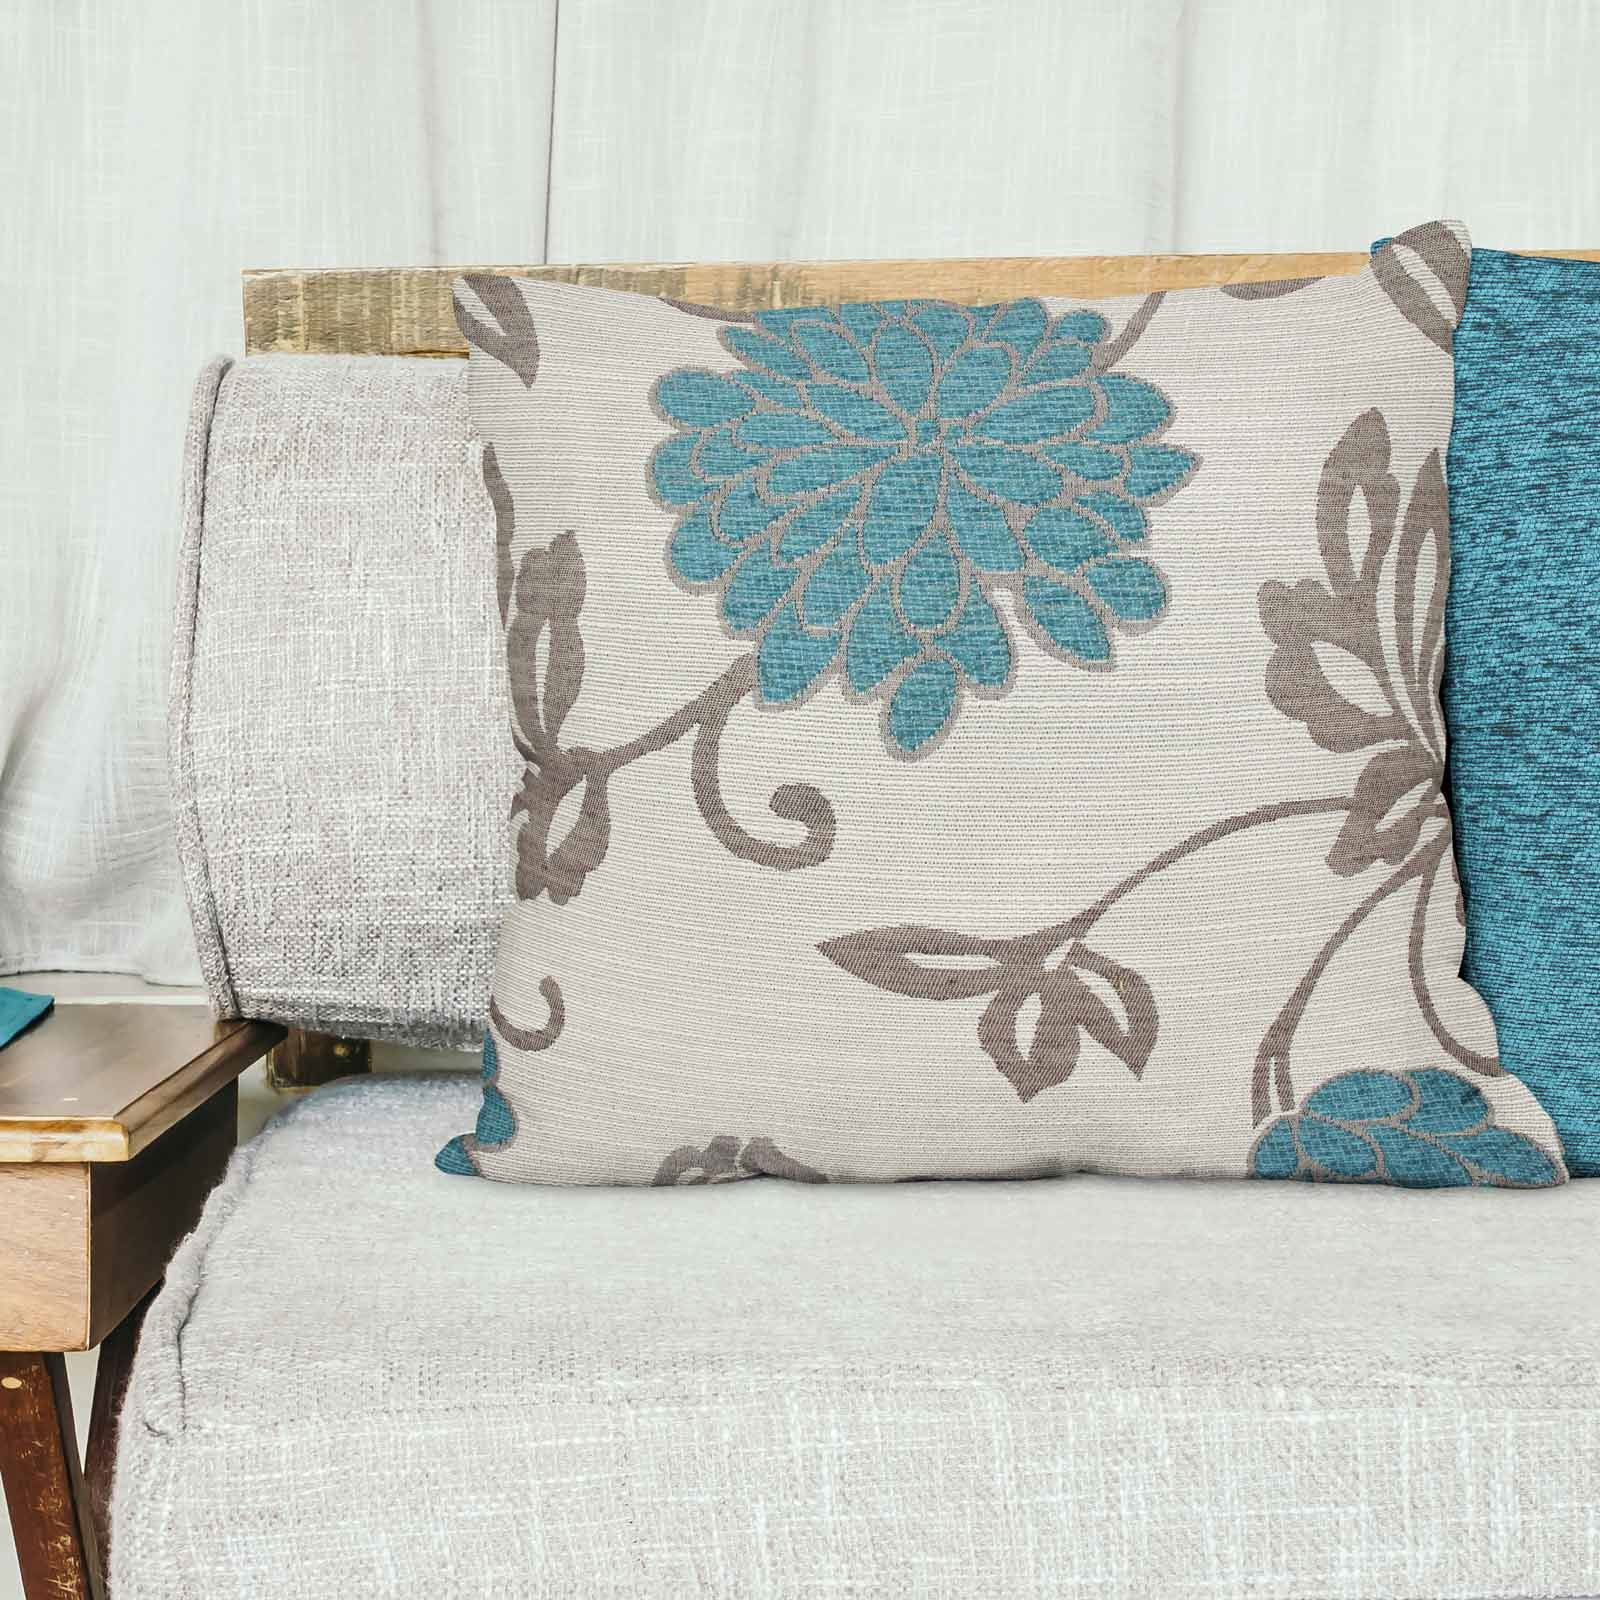 Teal-Blue-Duck-Egg-Cushion-Covers-18-034-x18-034-45cm-x-45cm-Luxury-Cover thumbnail 25